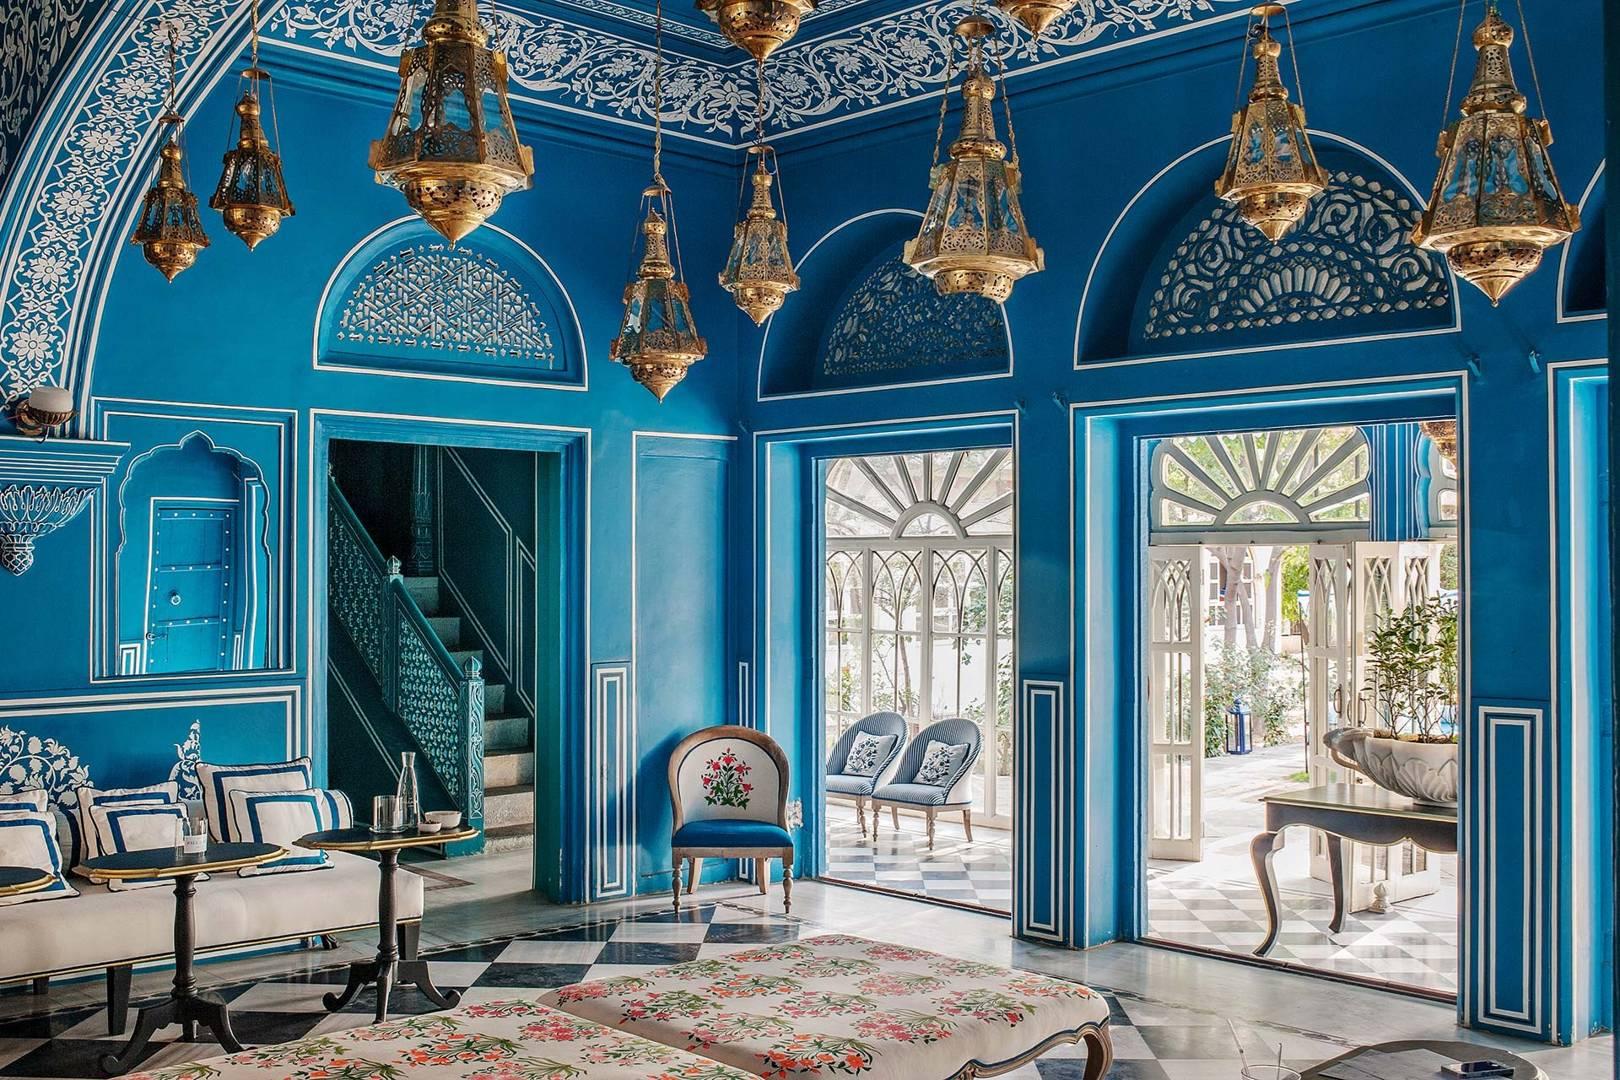 Jaipur Travel Guide | Travel Ideas For India U0026 Rajasthan | House U0026 Garden